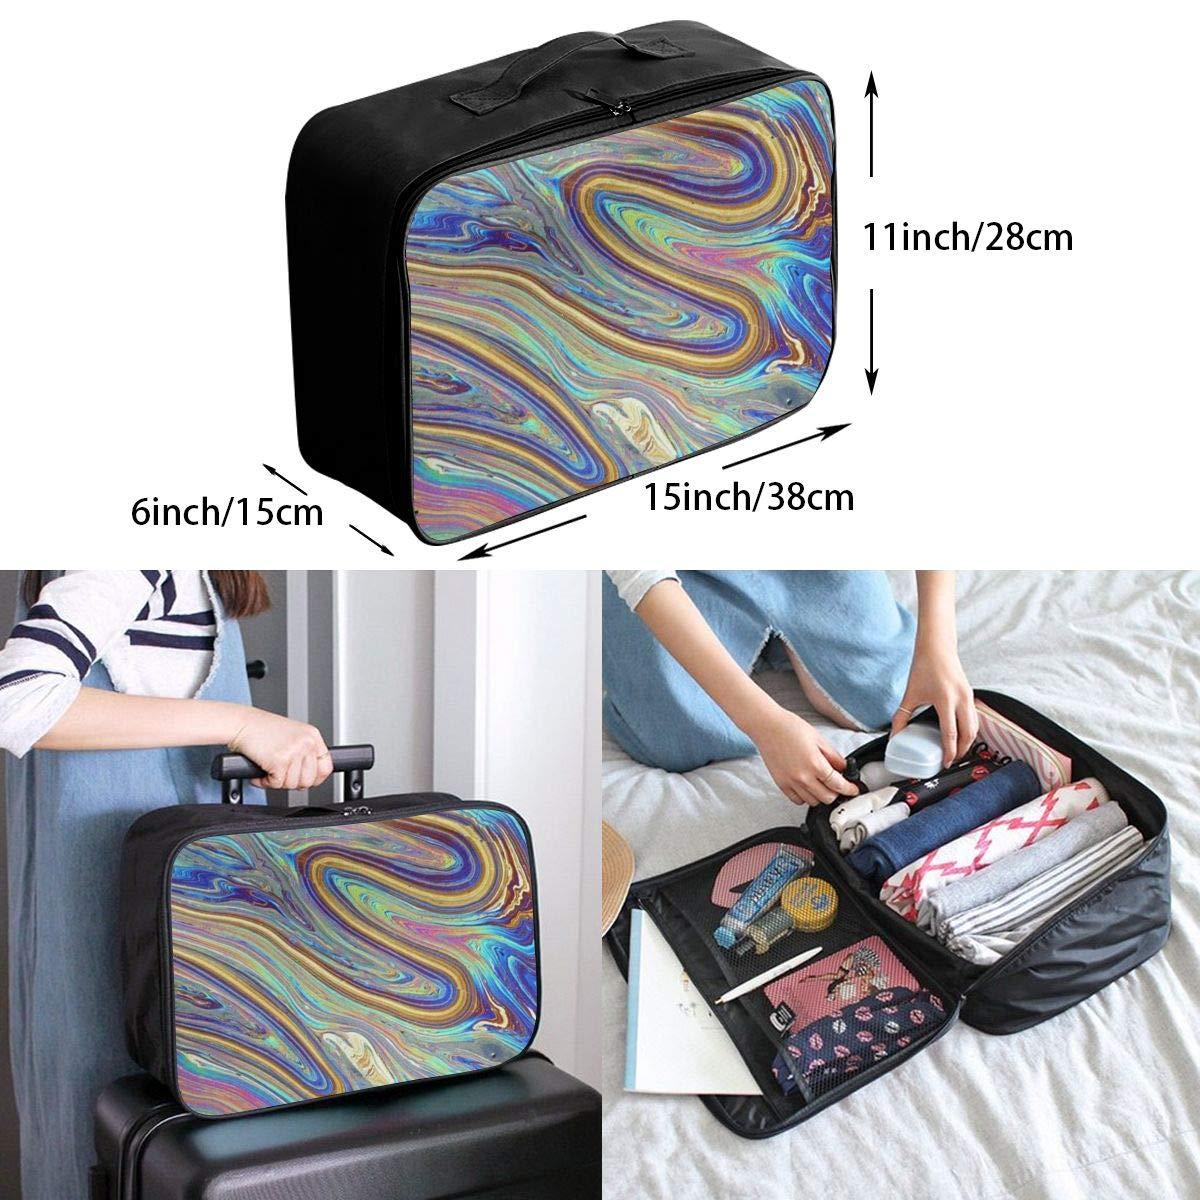 Travel Bags Rainbow Colored Portable Duffel Trolley Handle Luggage Bag